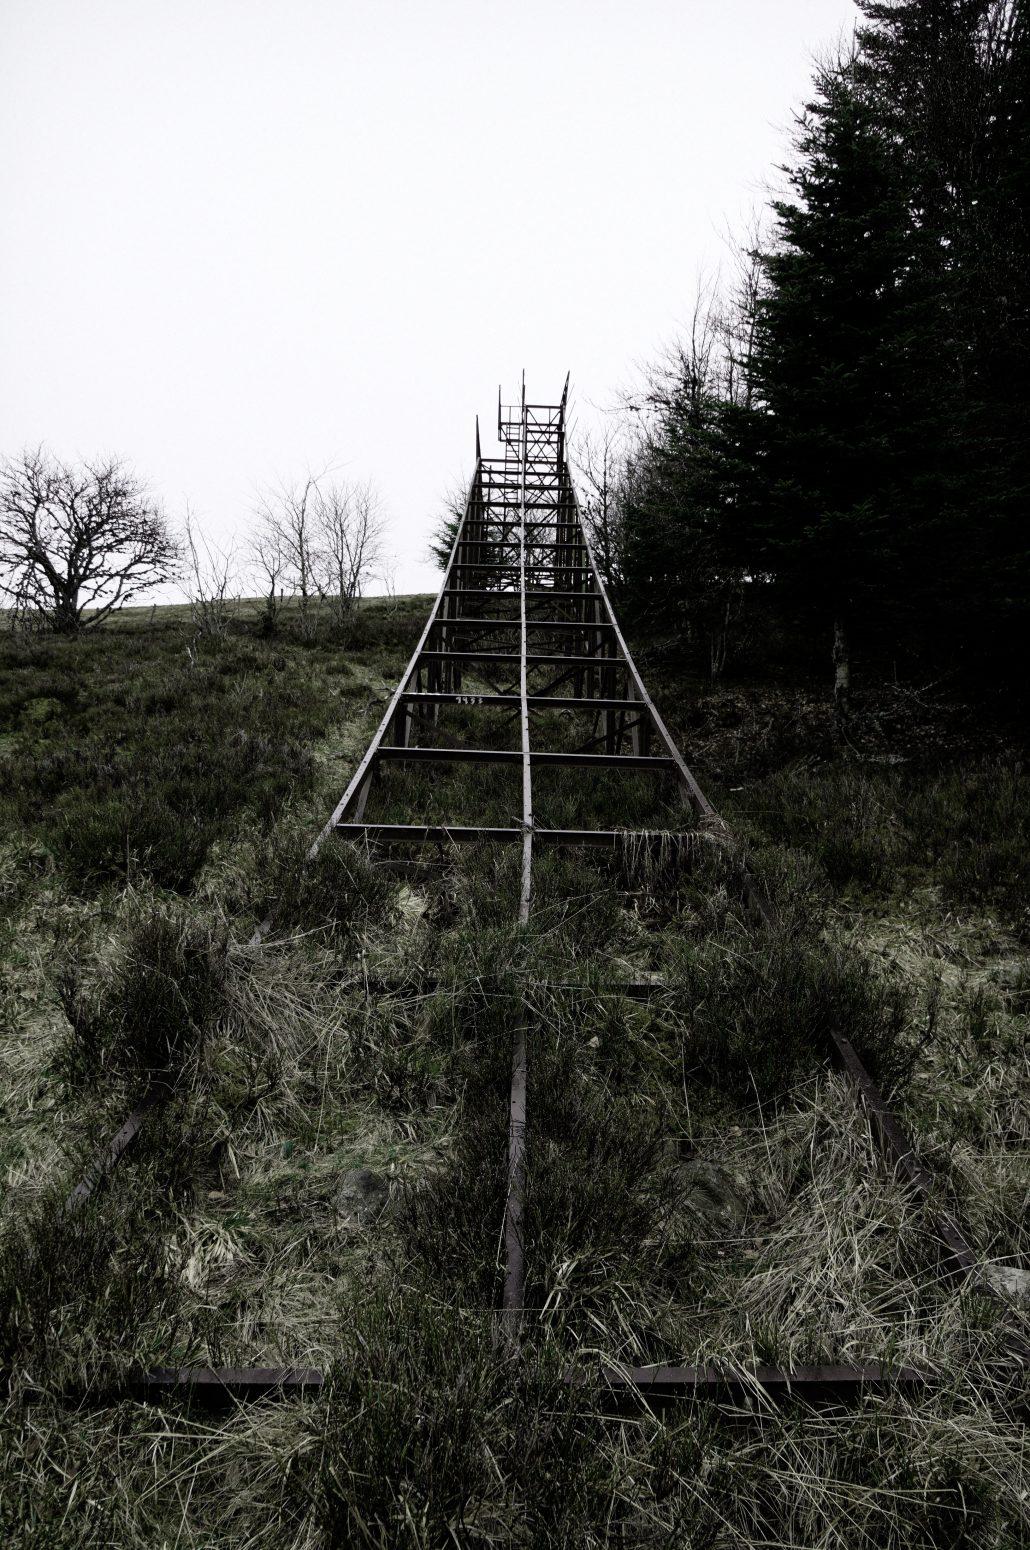 rampe de lancement